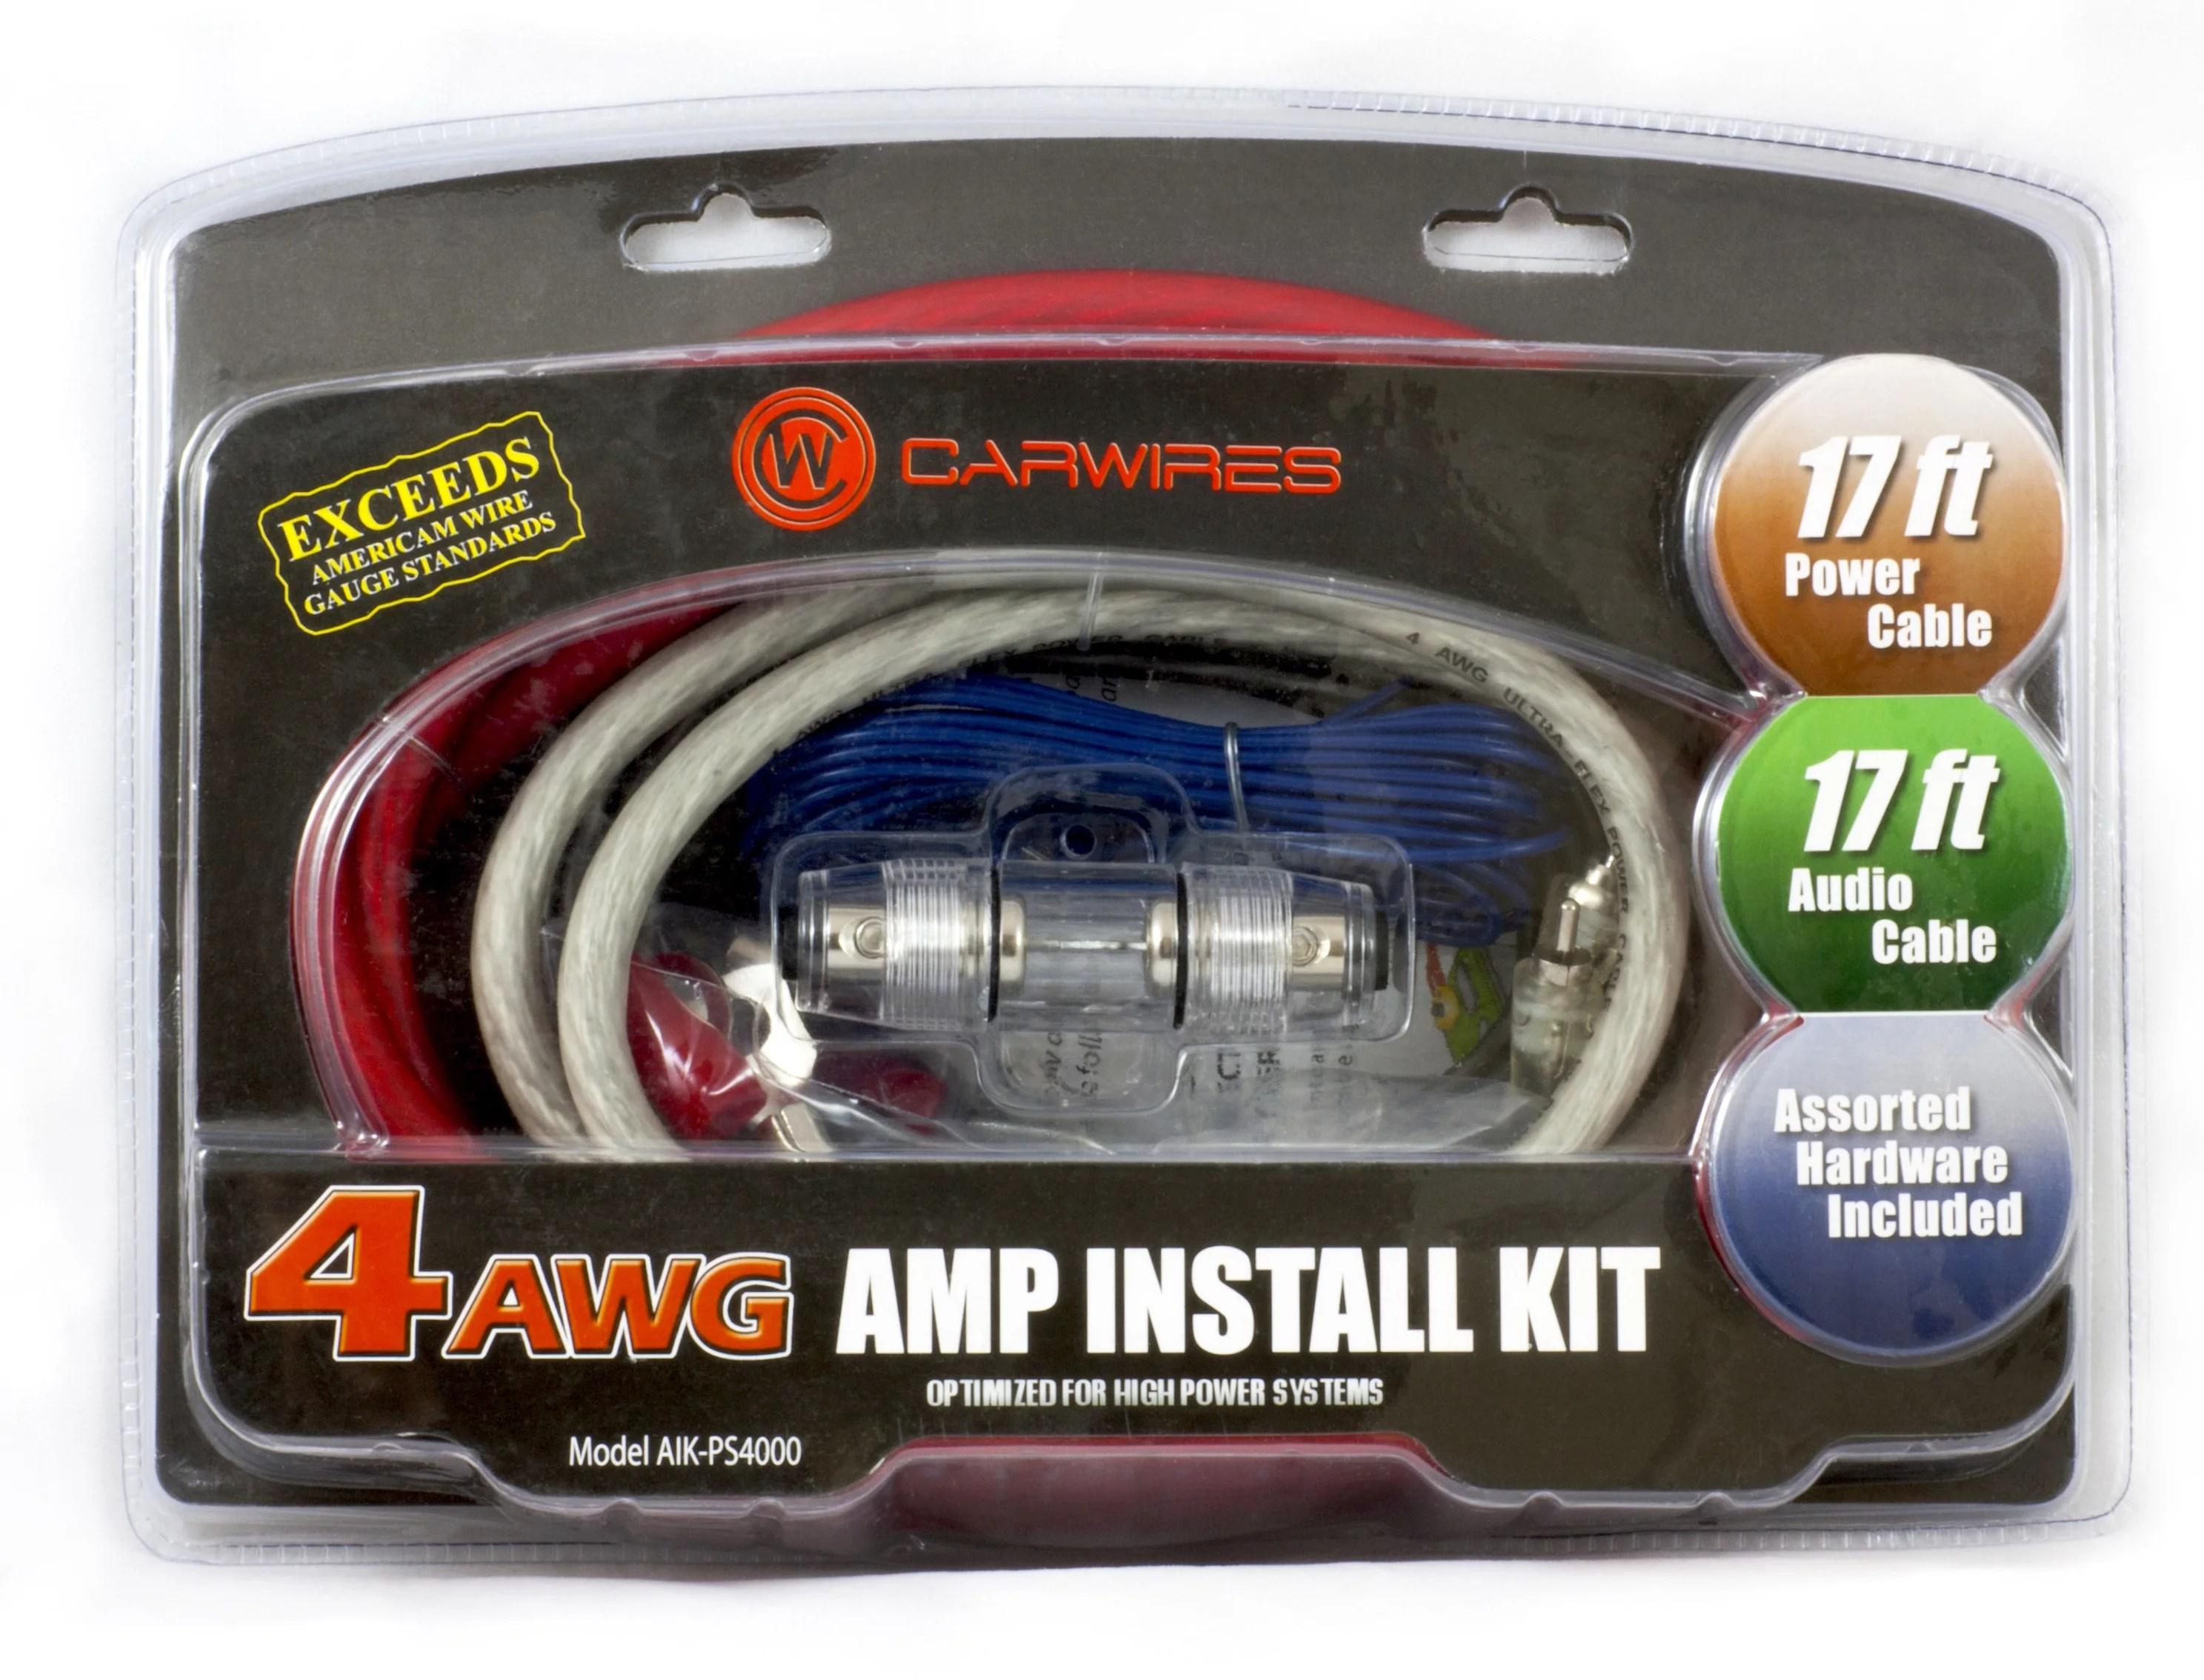 medium resolution of carwires aik ps4000 4 awg amplifier wiring kit walmart com car audio wiring kit walmart